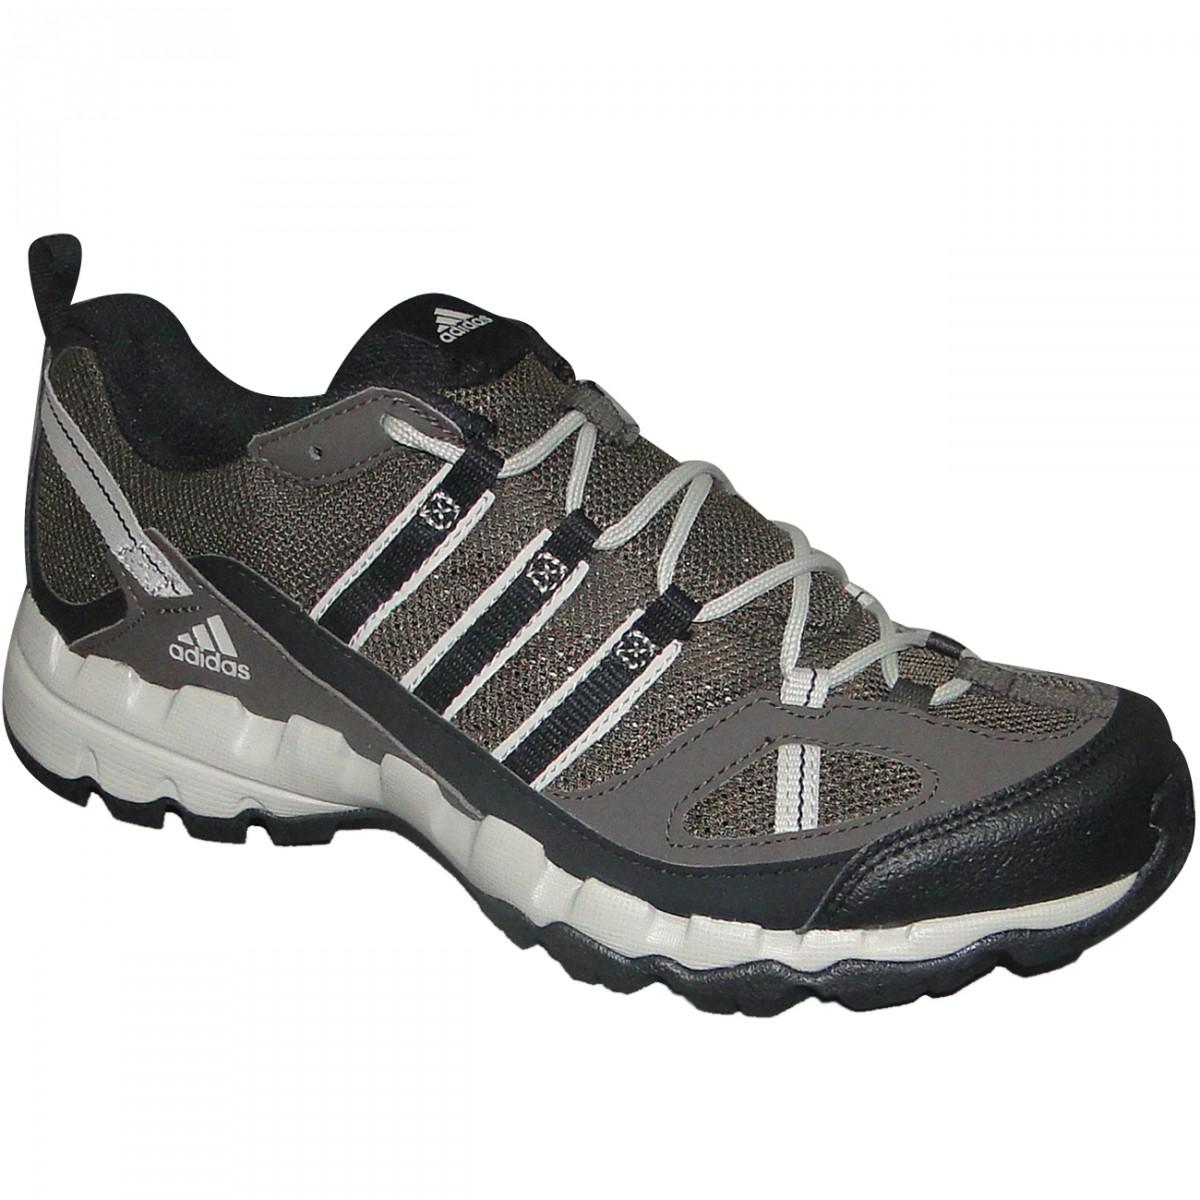 4c656b4c09f TENIS ADIDAS AX 1 G97053 - Musgo Preto Bege - Chuteira Nike